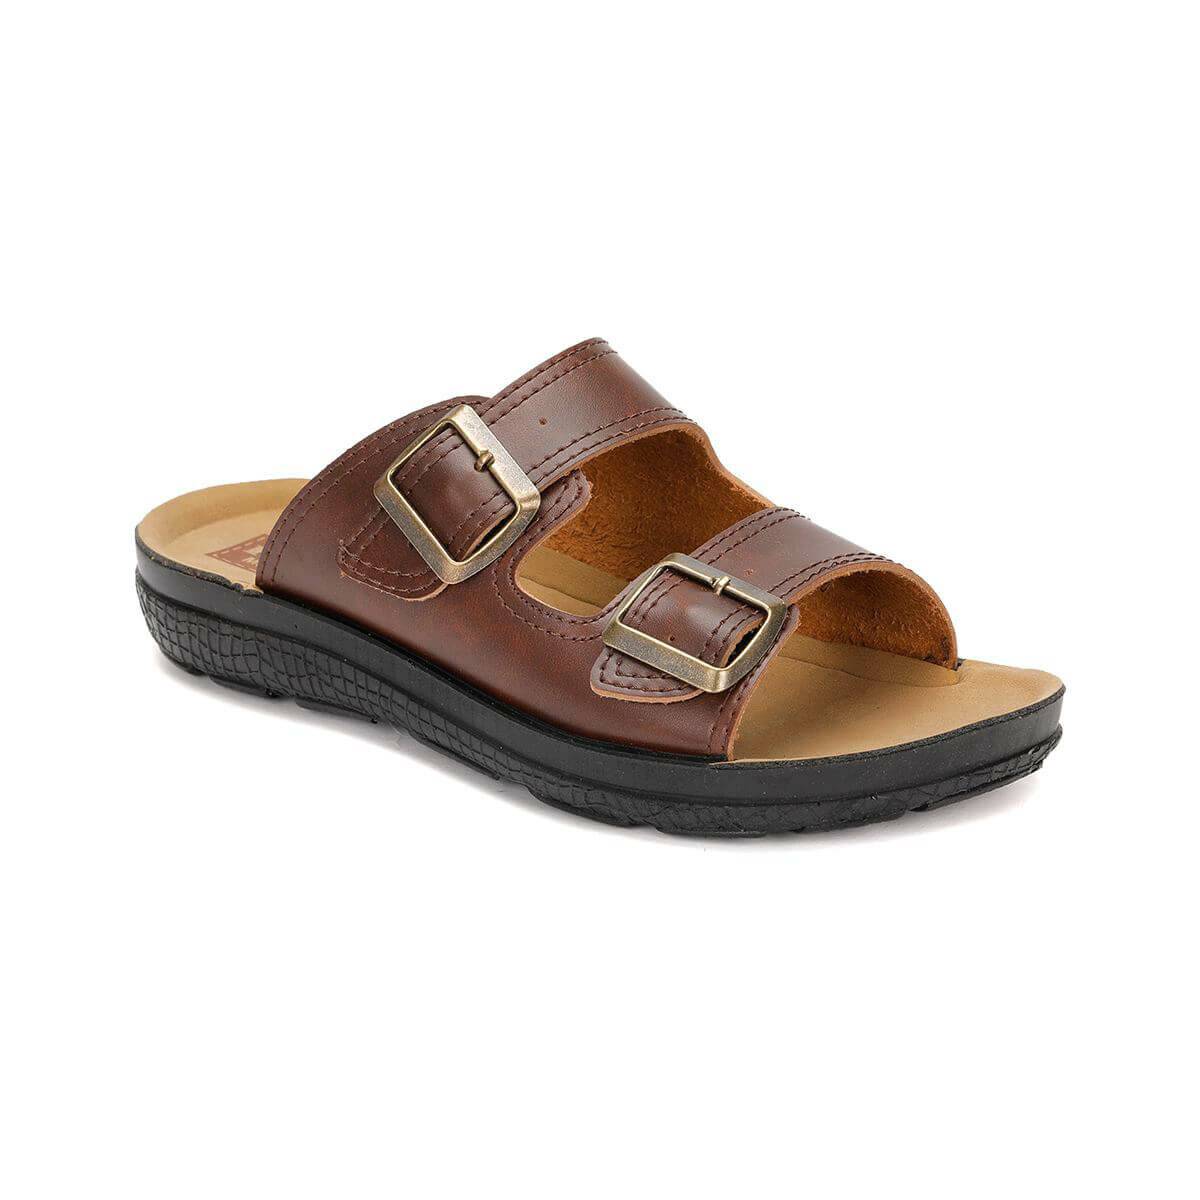 FLO Men Slipper Brown Color Summer Comfortable Casual Fashion Mens Slippers   BESS M 1602 Flexall